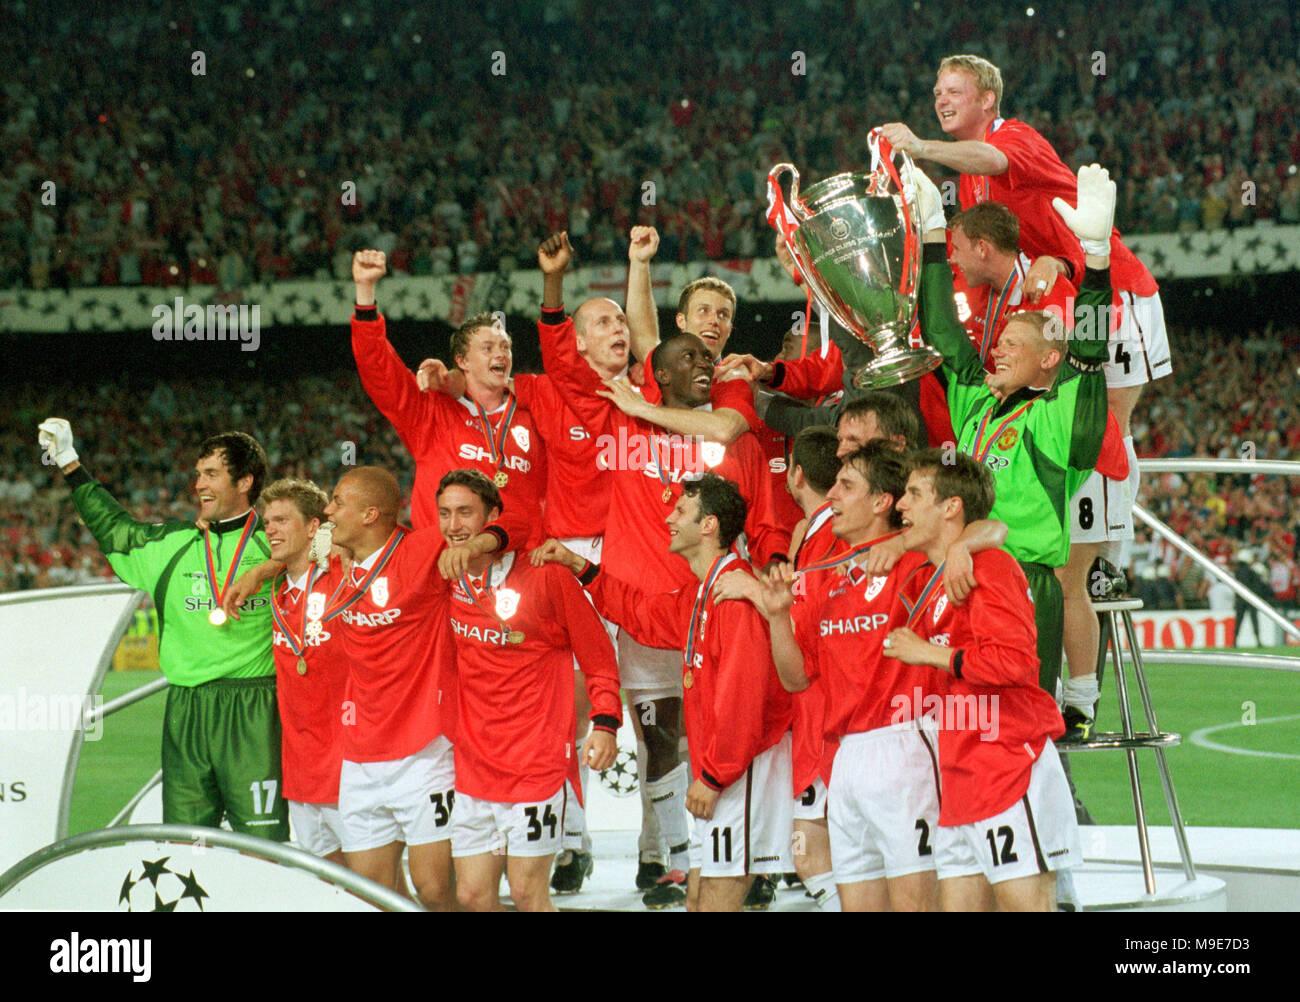 Stadium Camp Nou Barcelona Spain 2651999 UEFA Champions League Final Manchester United Vs FC Bayern Munich 21 Team Present The